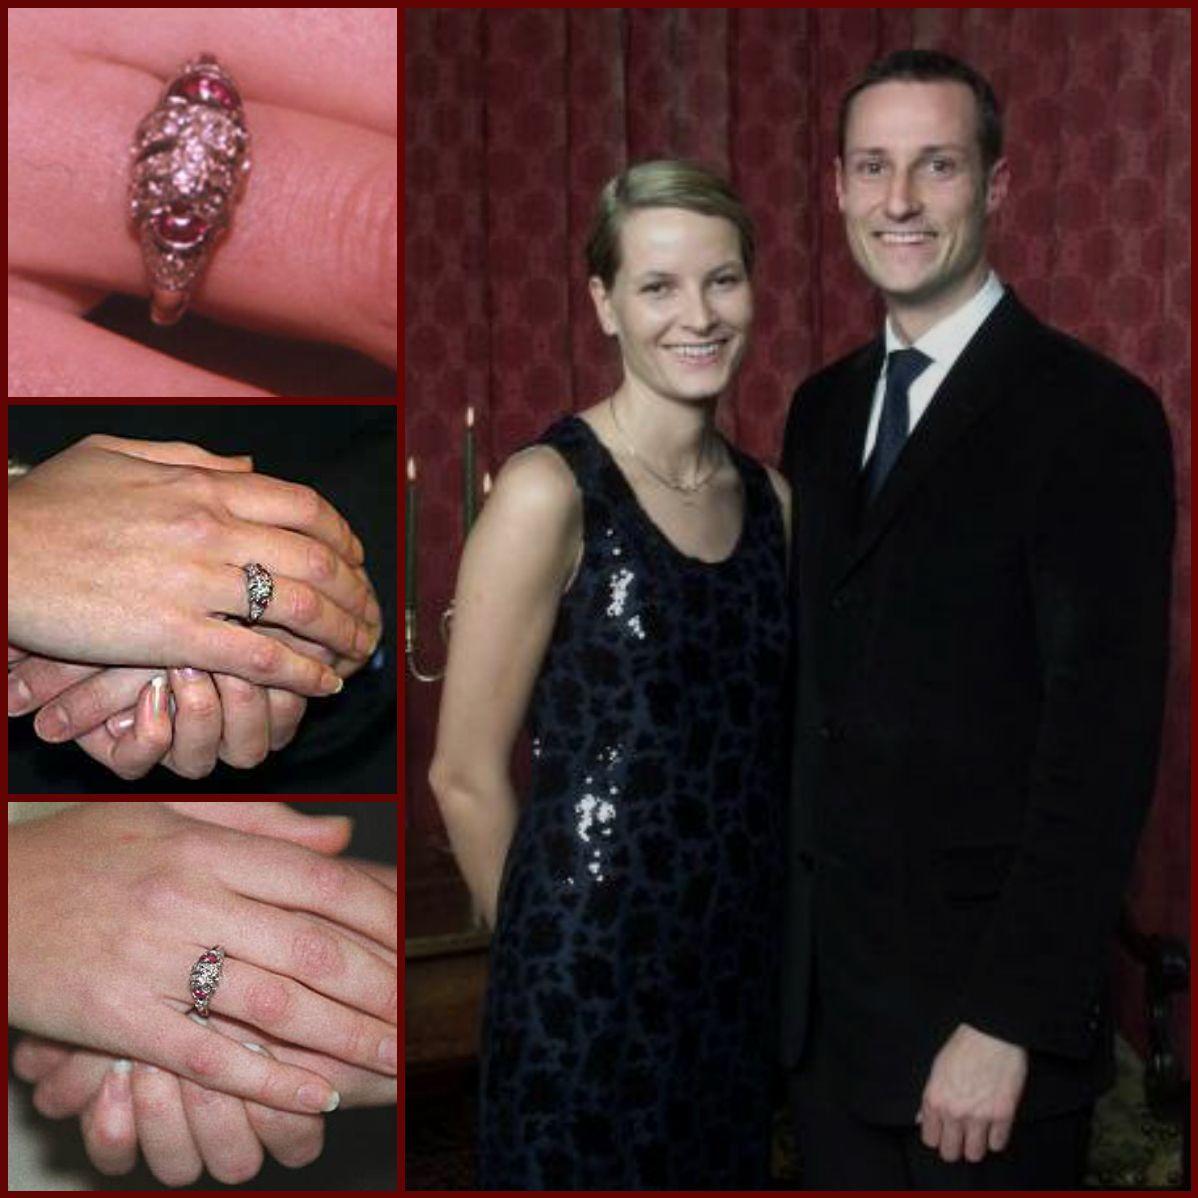 Engagement Ring Of Crown Princess Mette-Marit Of Norway